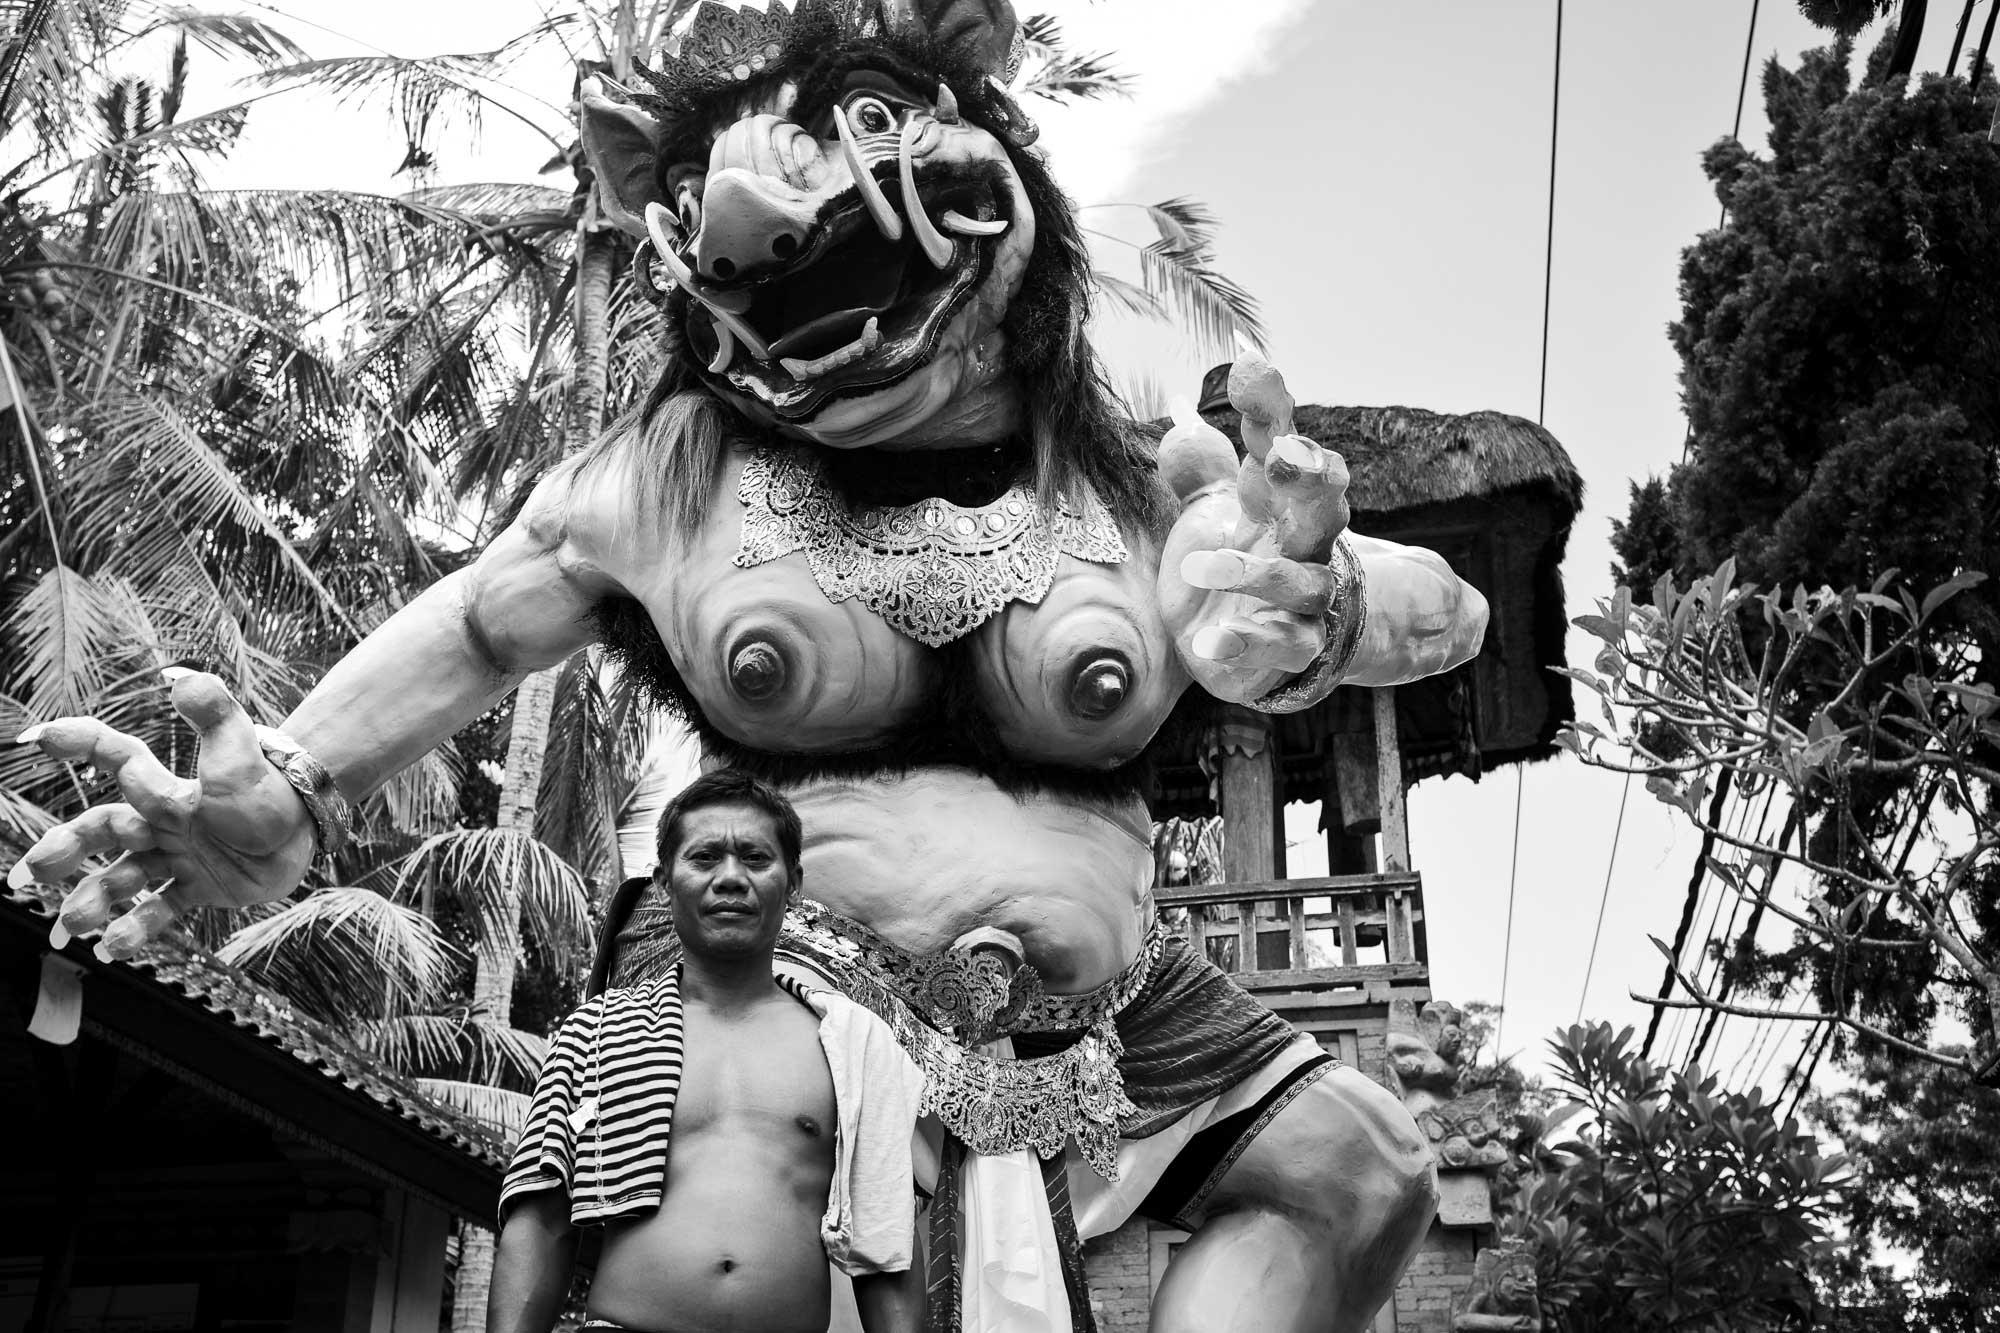 Ogoh-ogoh - Bali Street Photographer